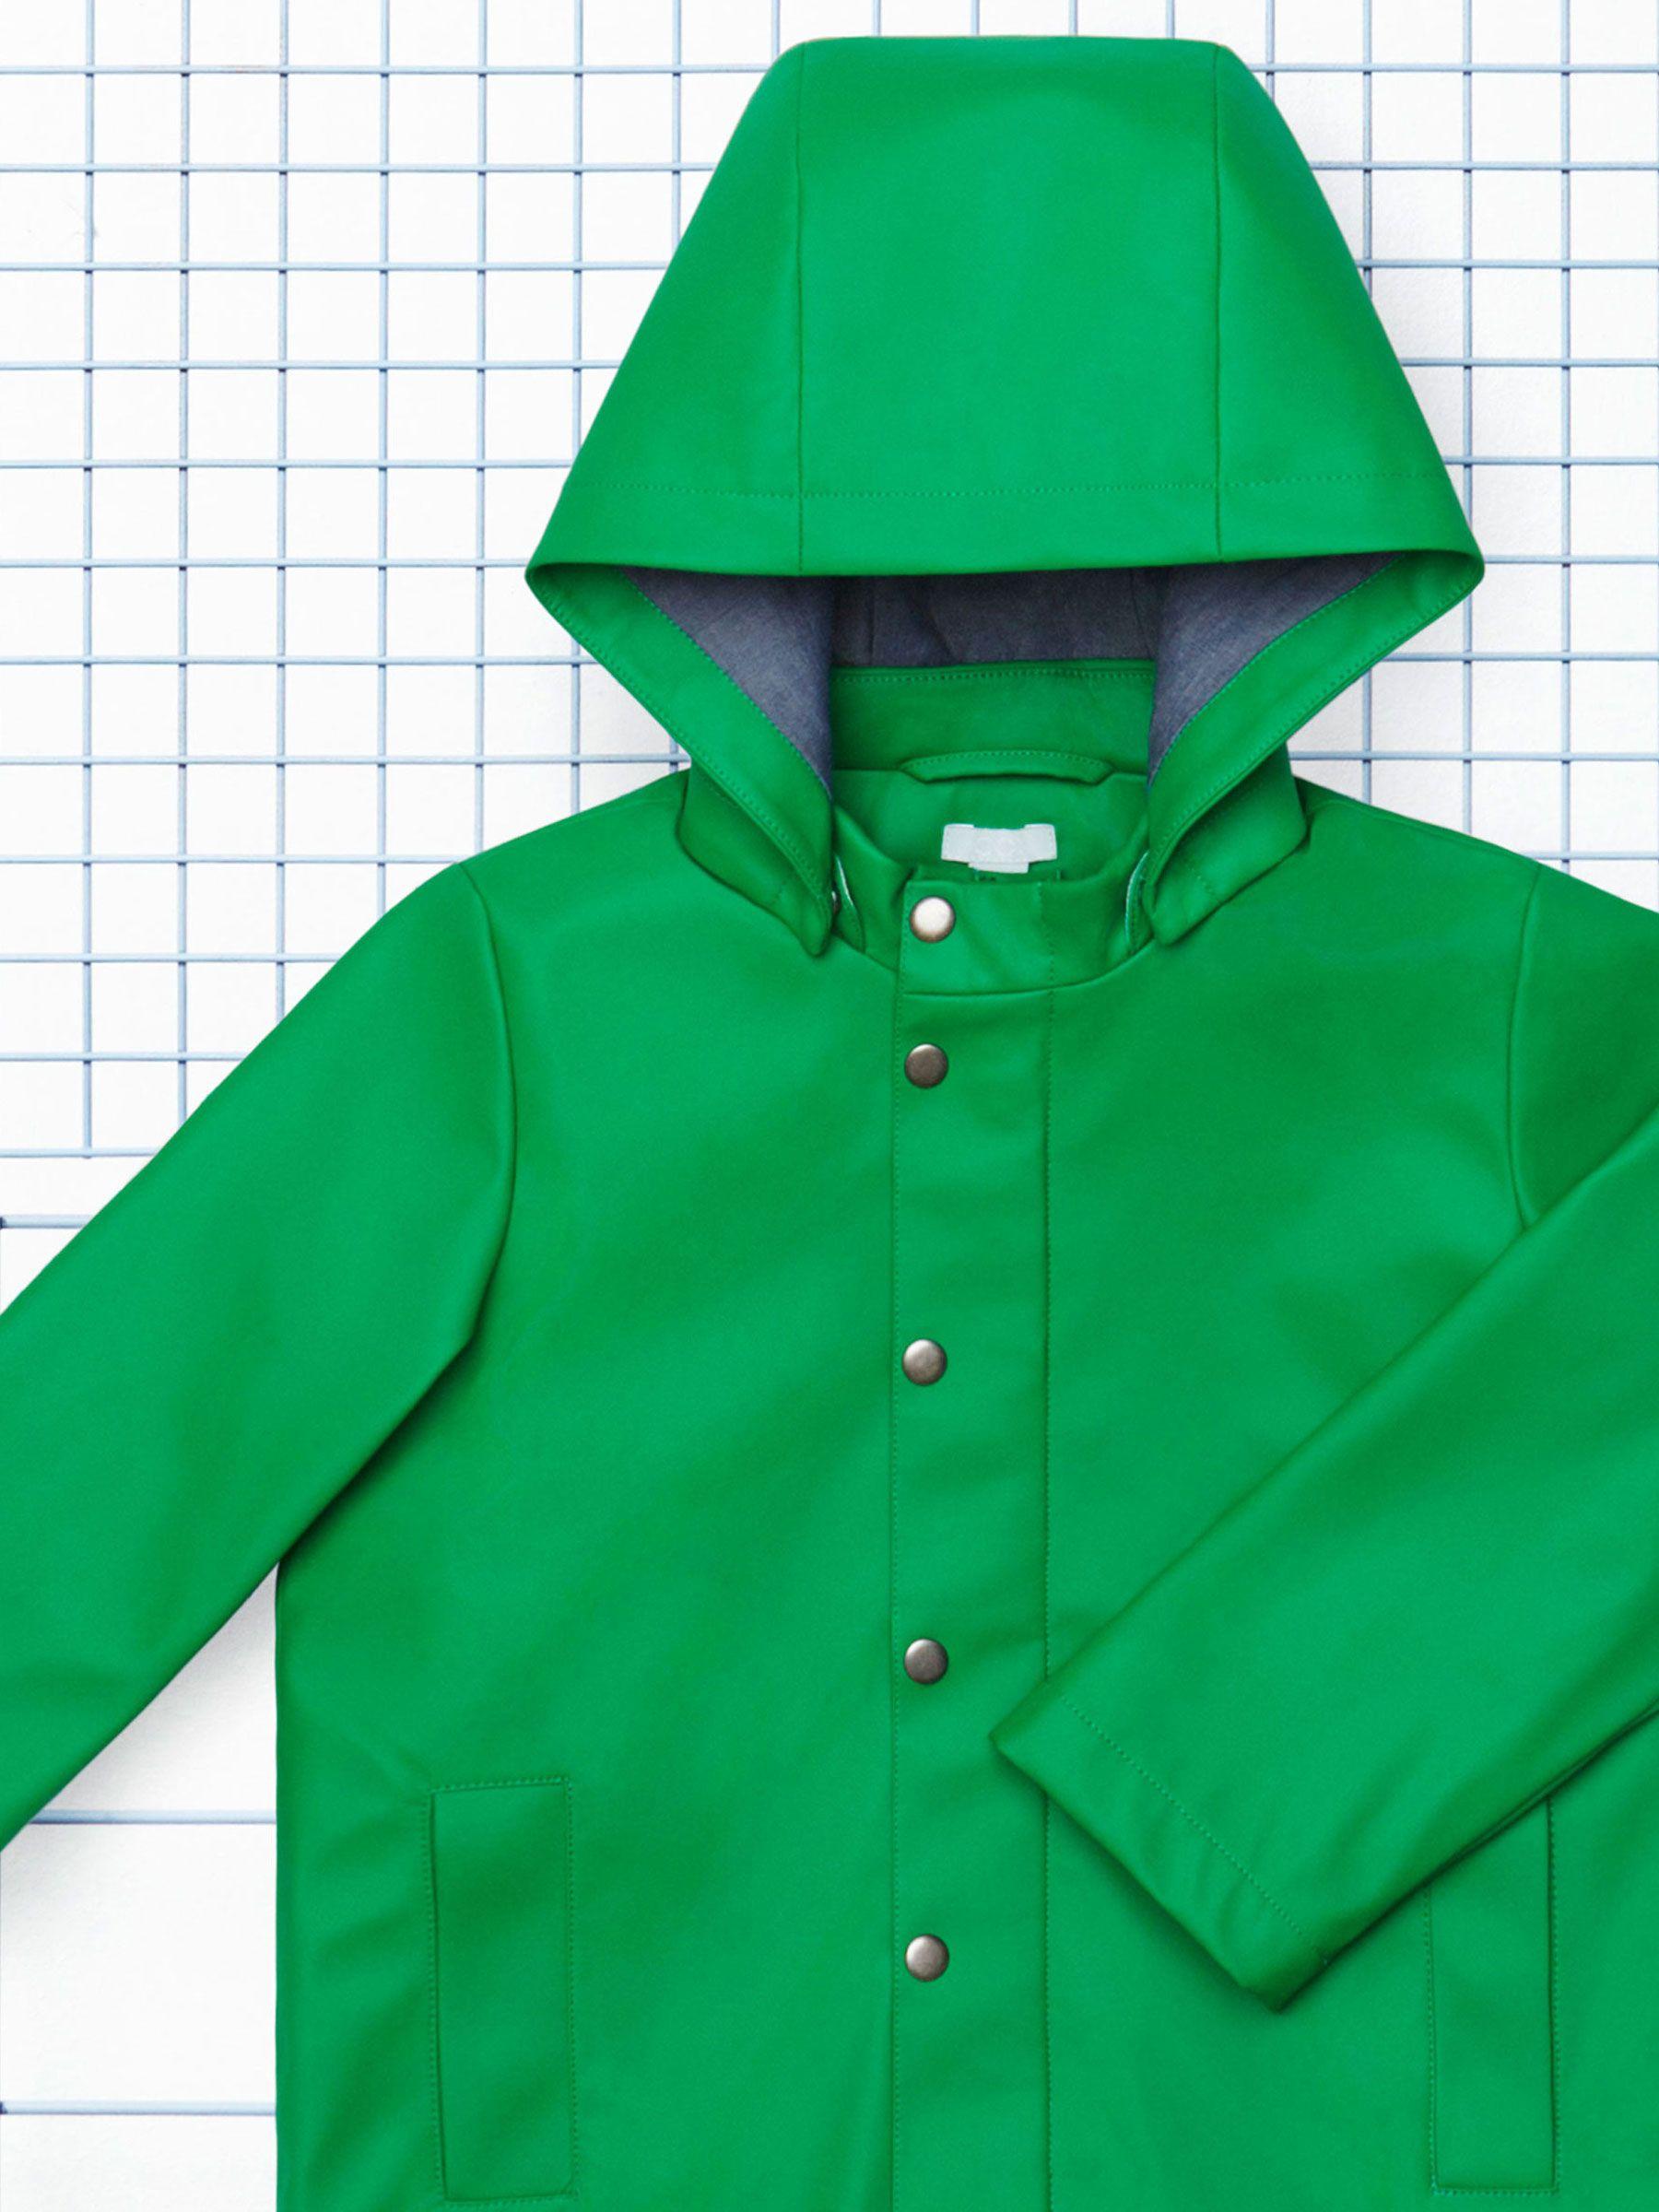 1447057f6e68 COS   New arrivals for smaller wardrobes   Petit garçon   Fashion ...